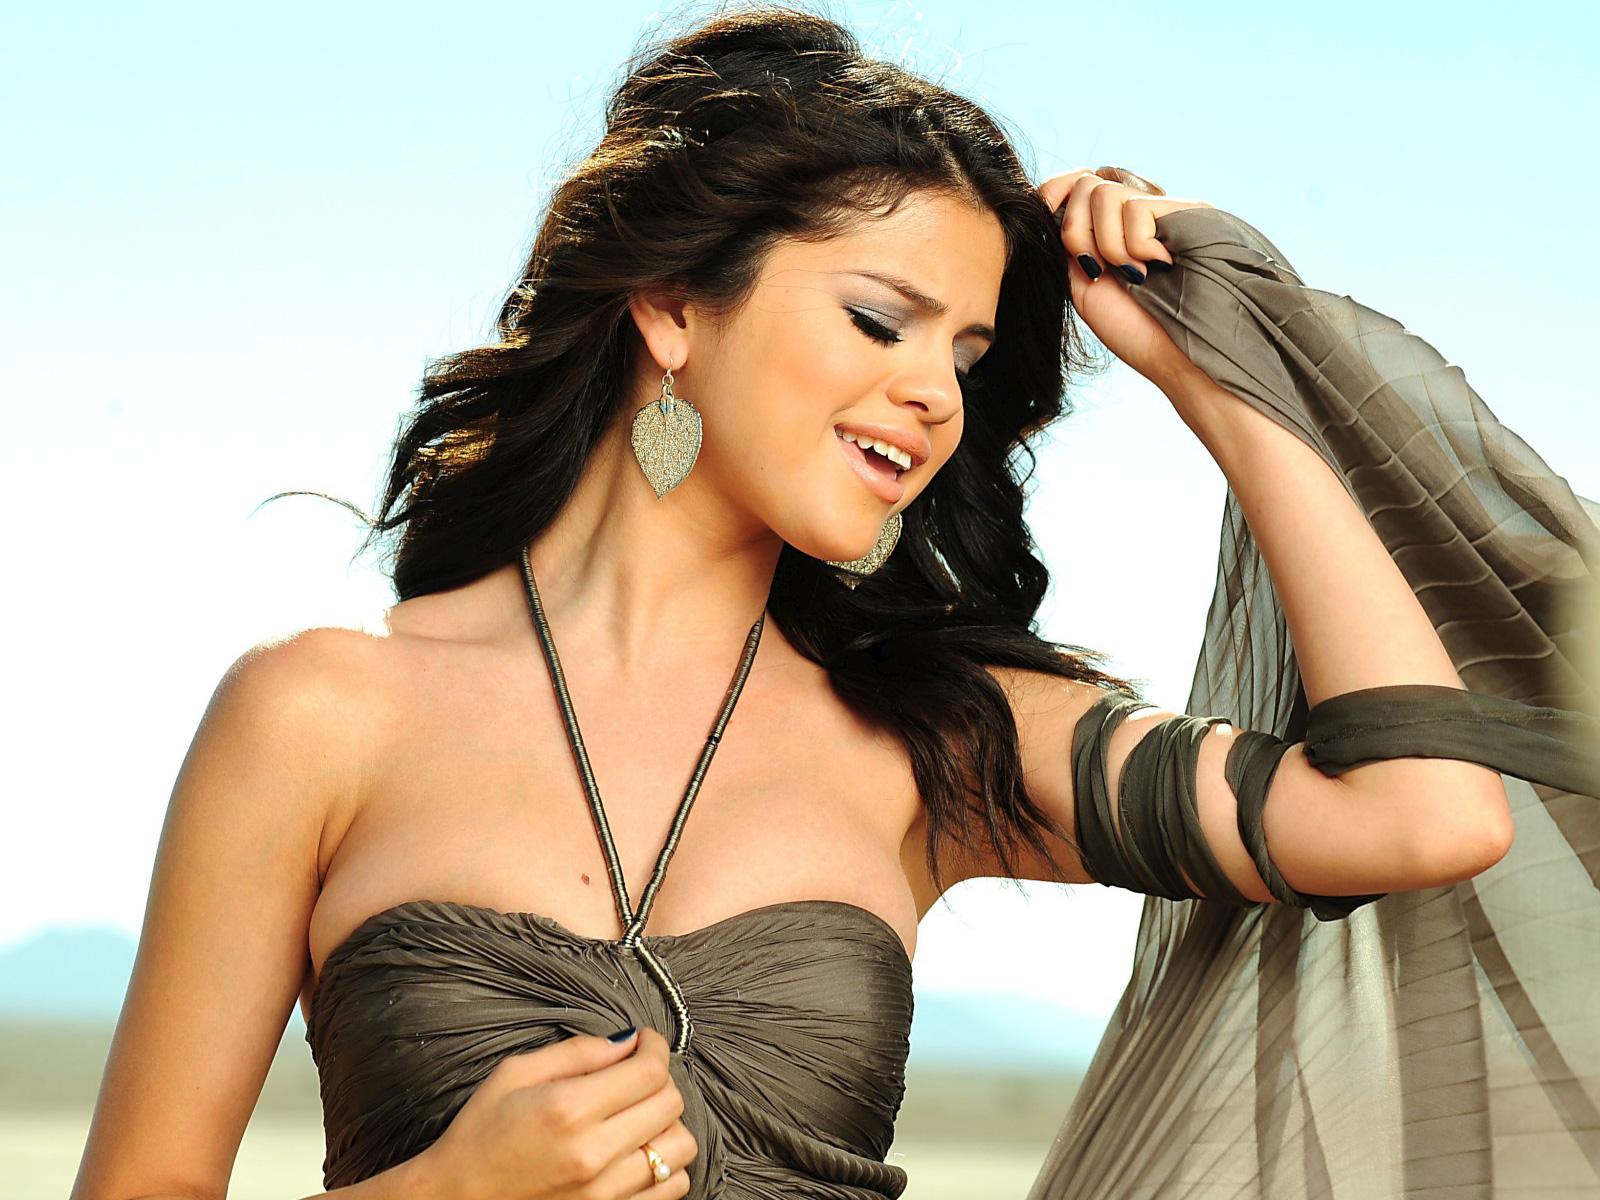 Selena Gomez A Year Without Rain wallpaper